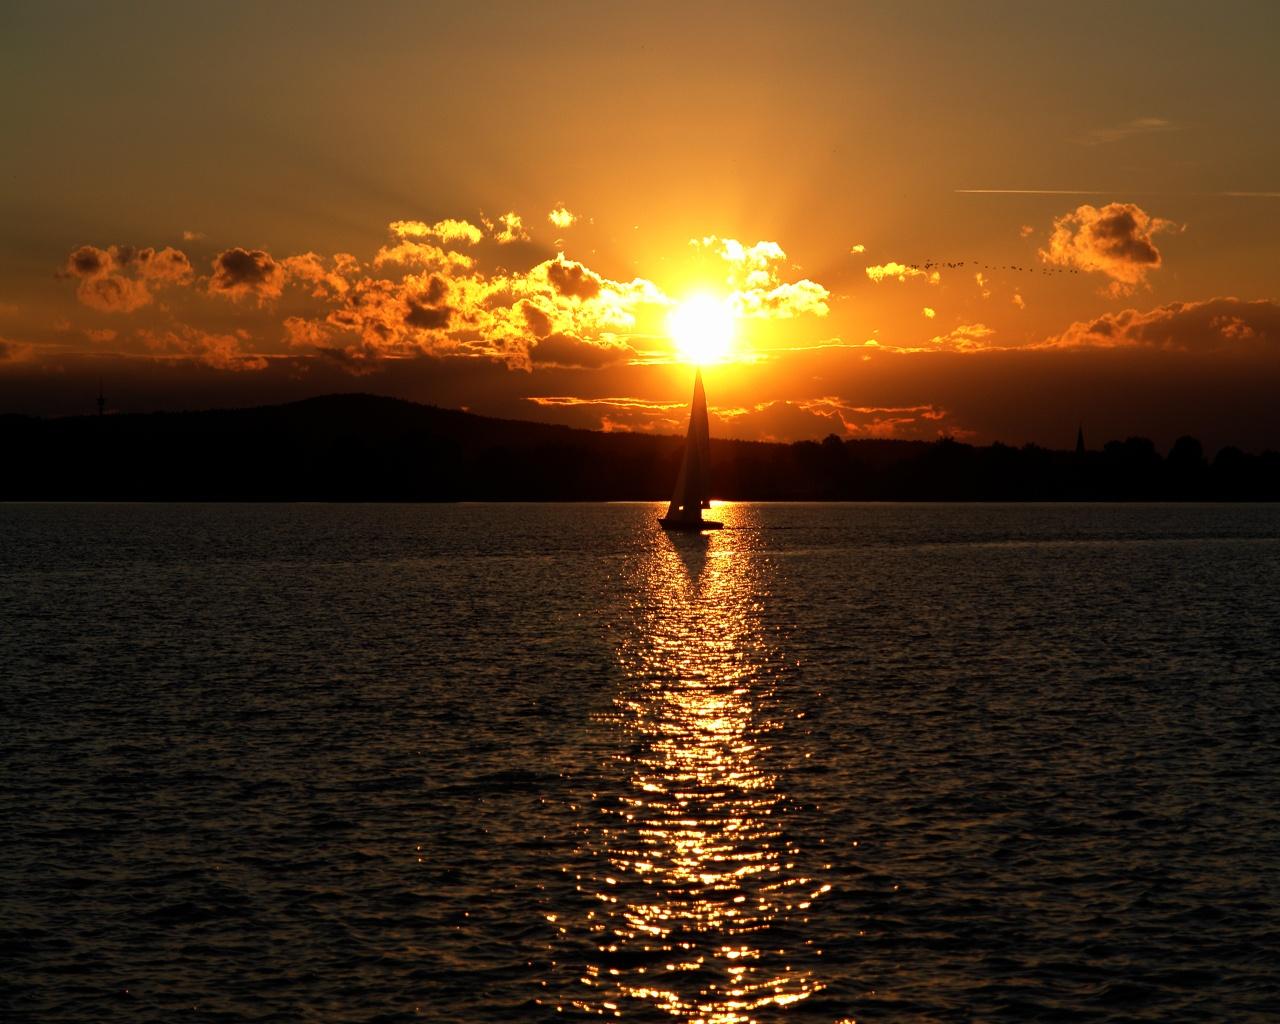 Natural Landscape Pic, the Peaceful Sea, a Sailing Boat ...